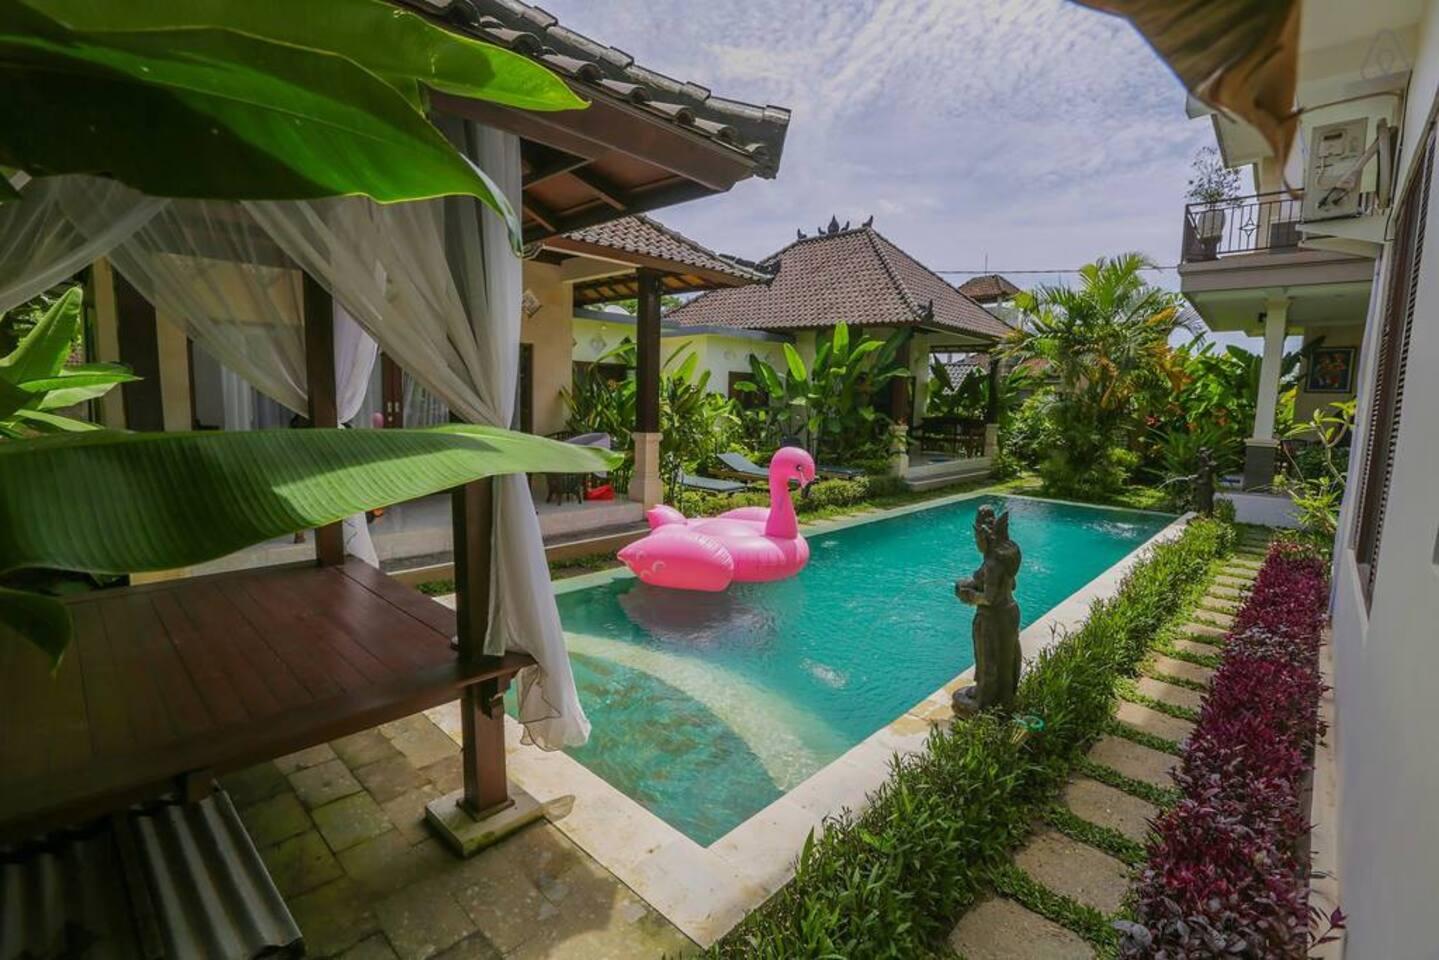 6 rooms + swimming pool + gazebo + free wifi +  good location